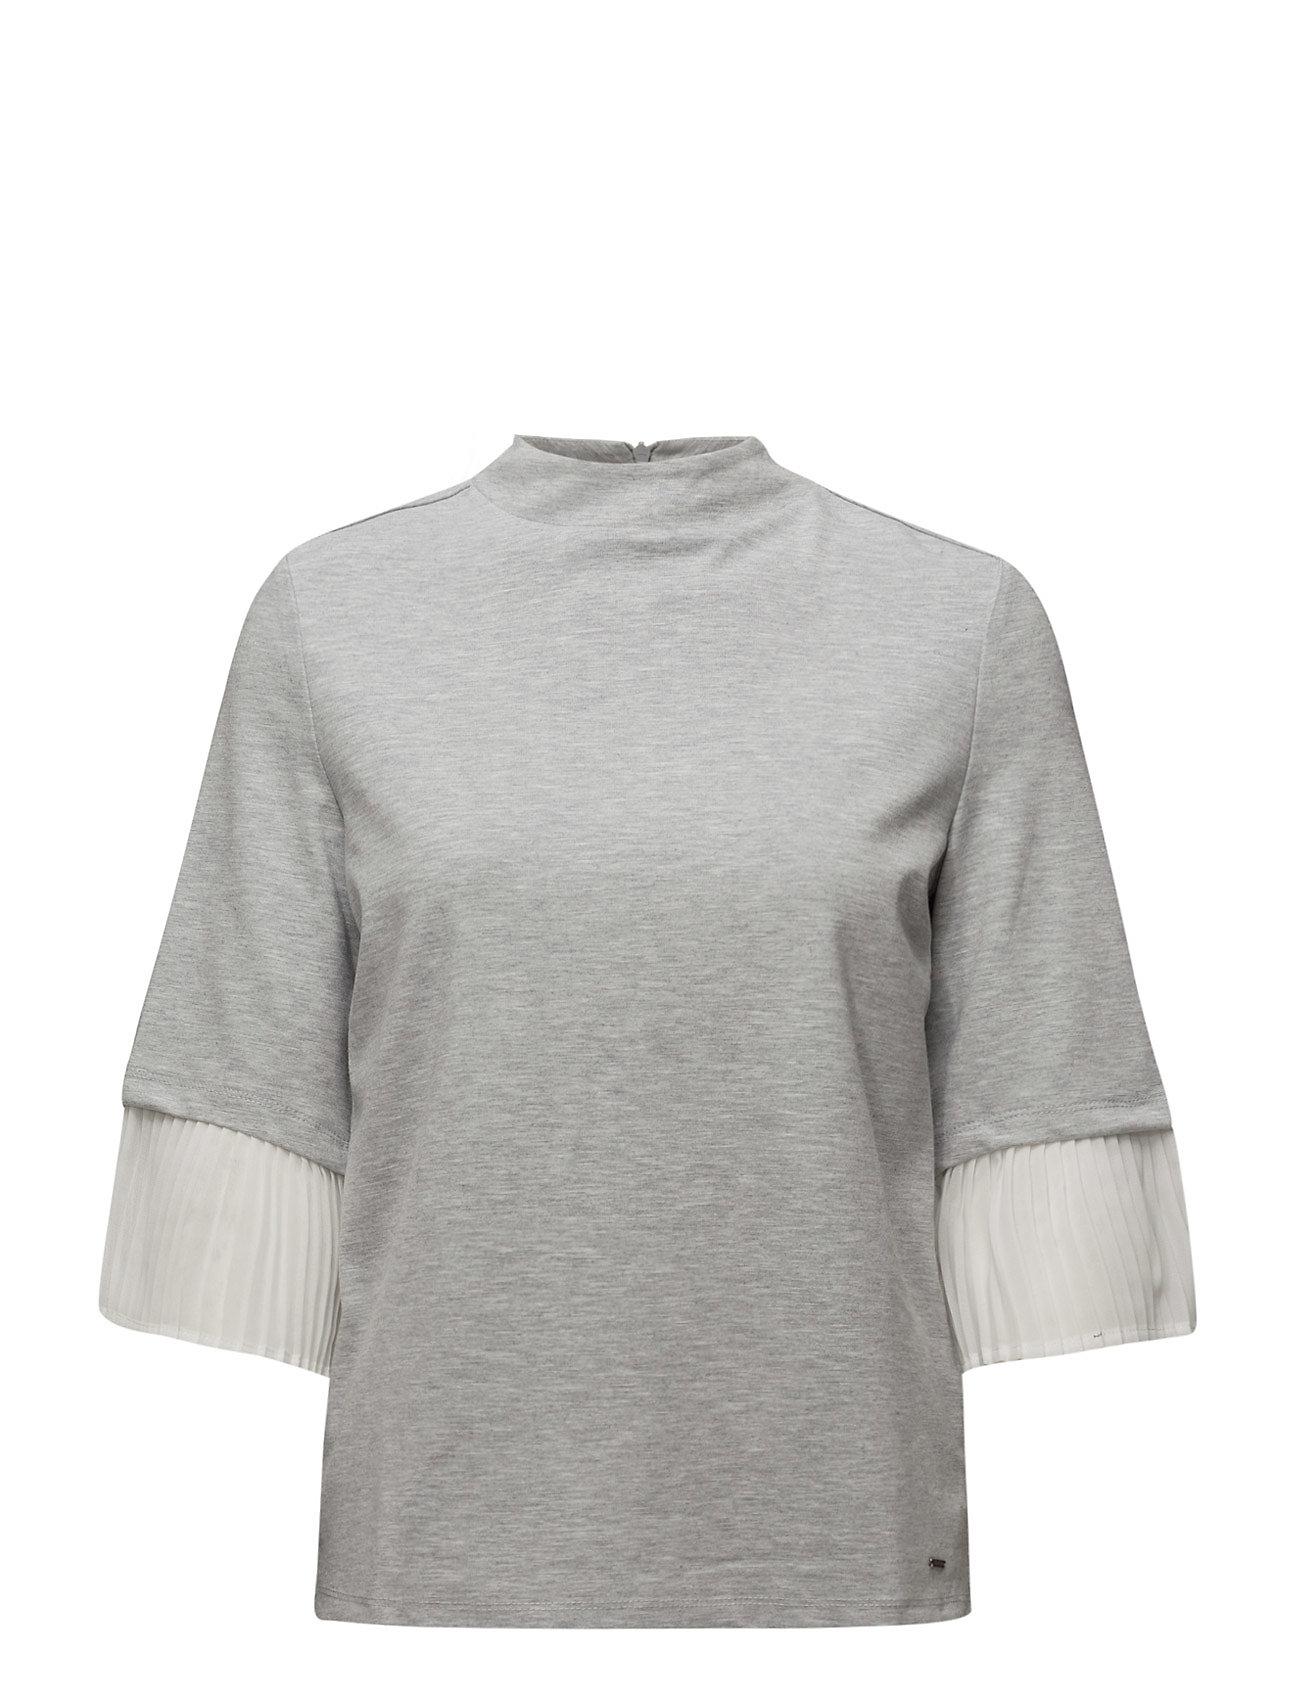 T-shirt 3/4-sleeve r fra taifun på boozt.com dk